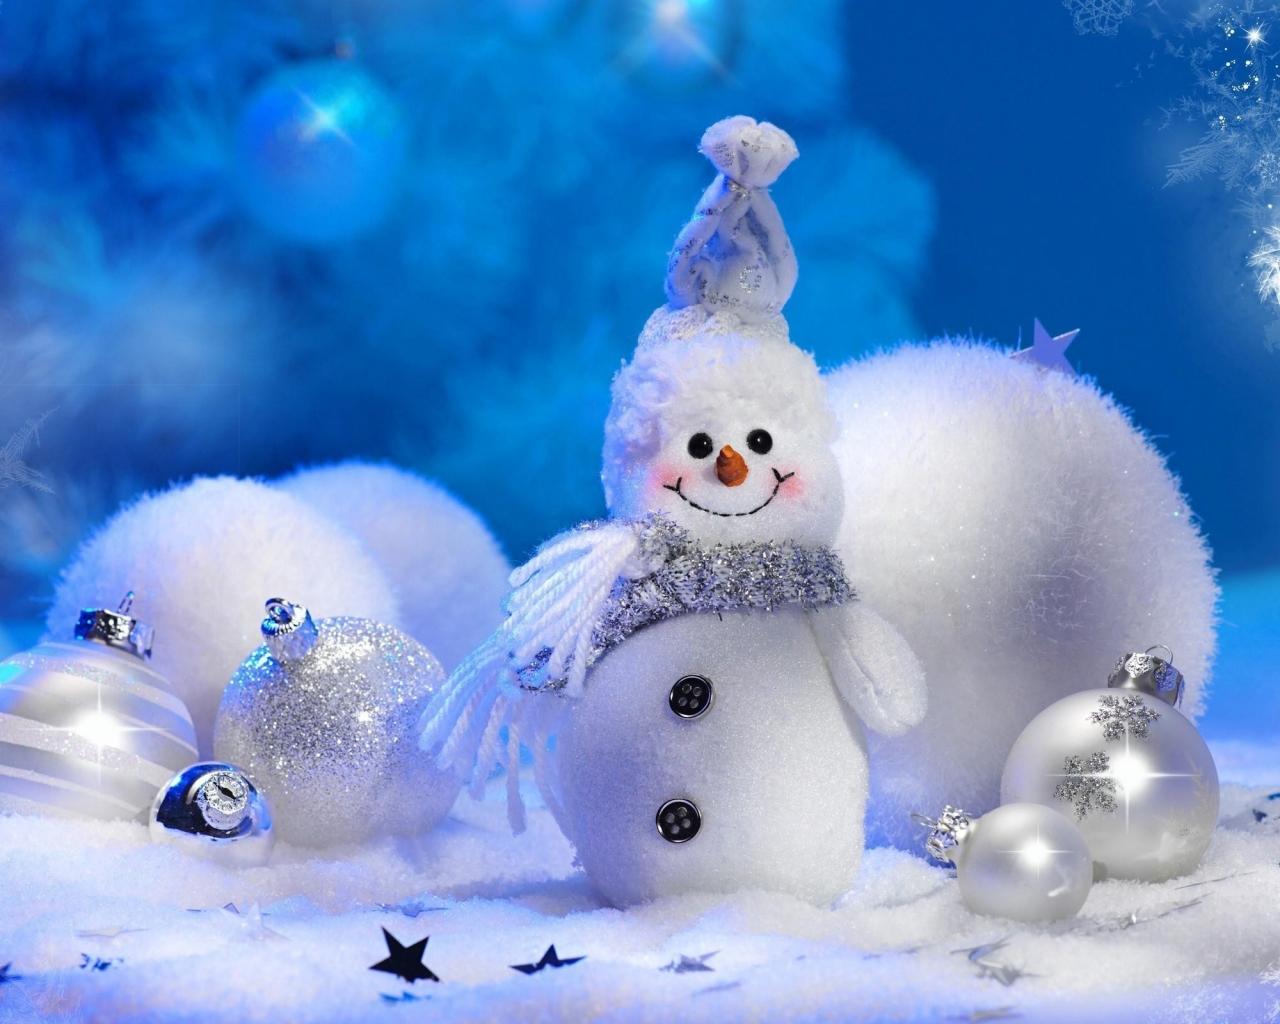 Peluche de navidad - 1280x1024